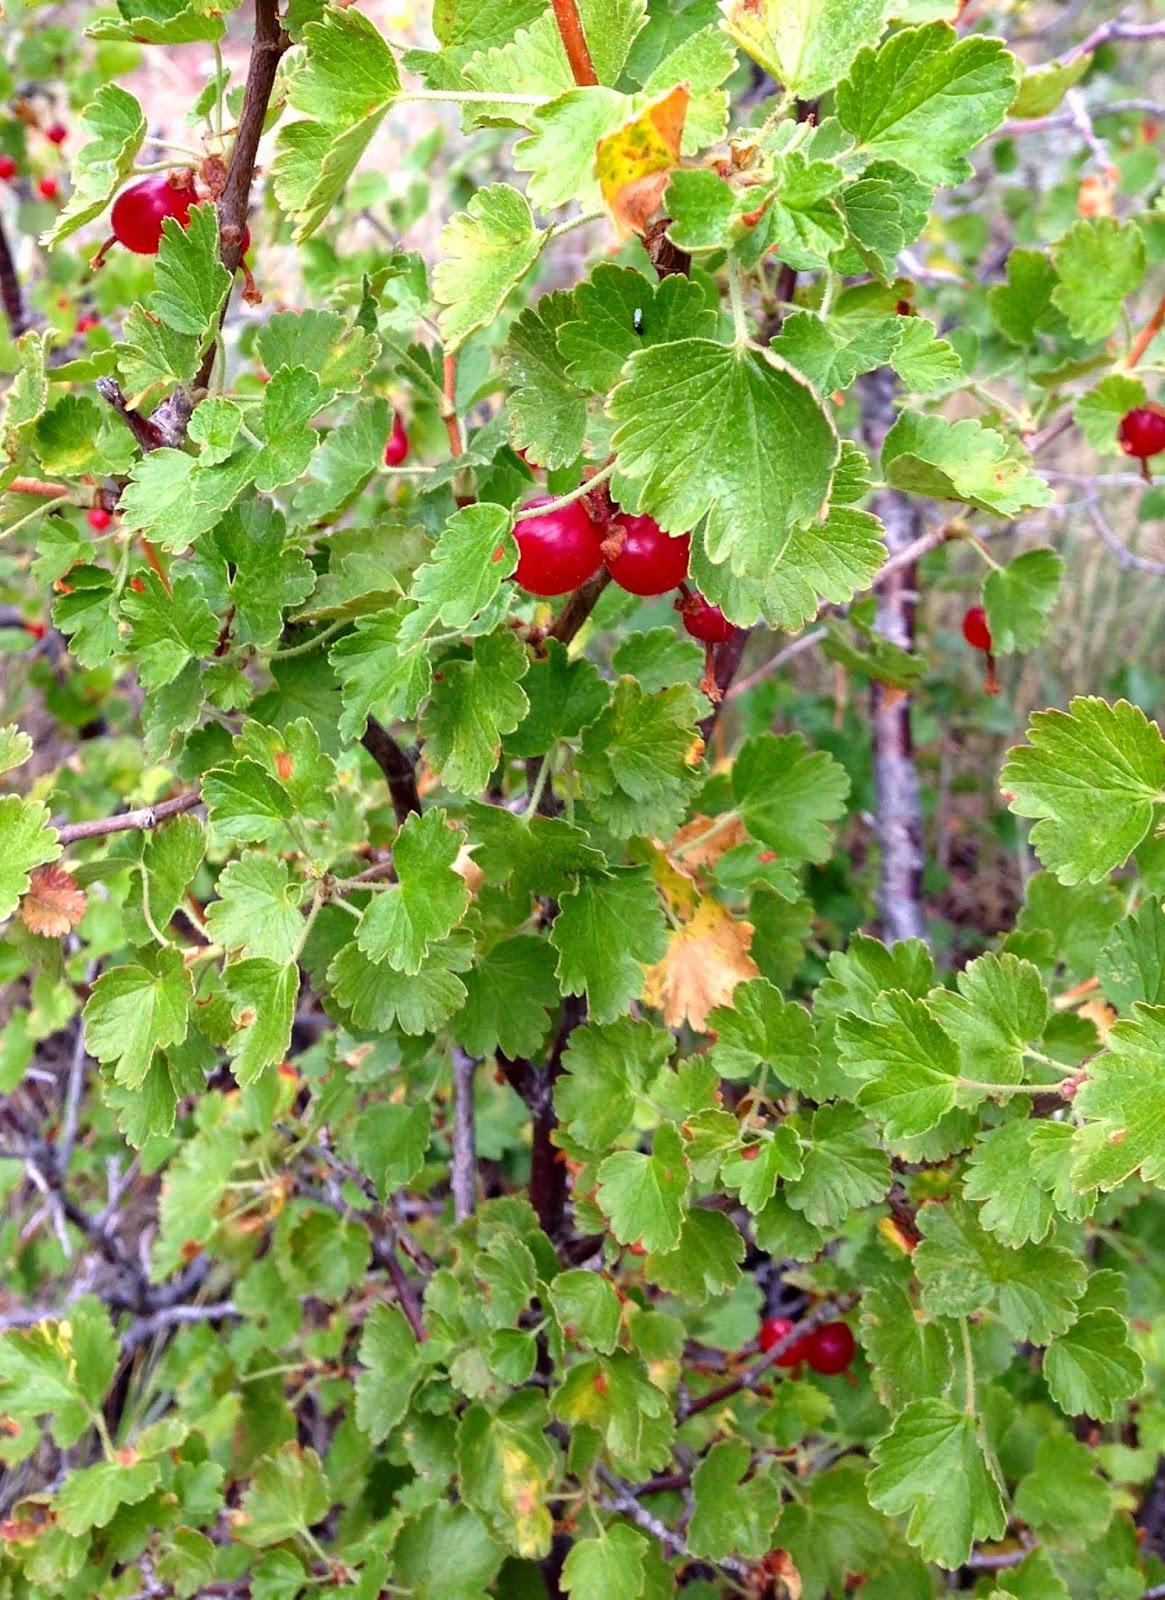 Rocky Mountain Bushcraft: Rocky Mountain Edible Plant ...